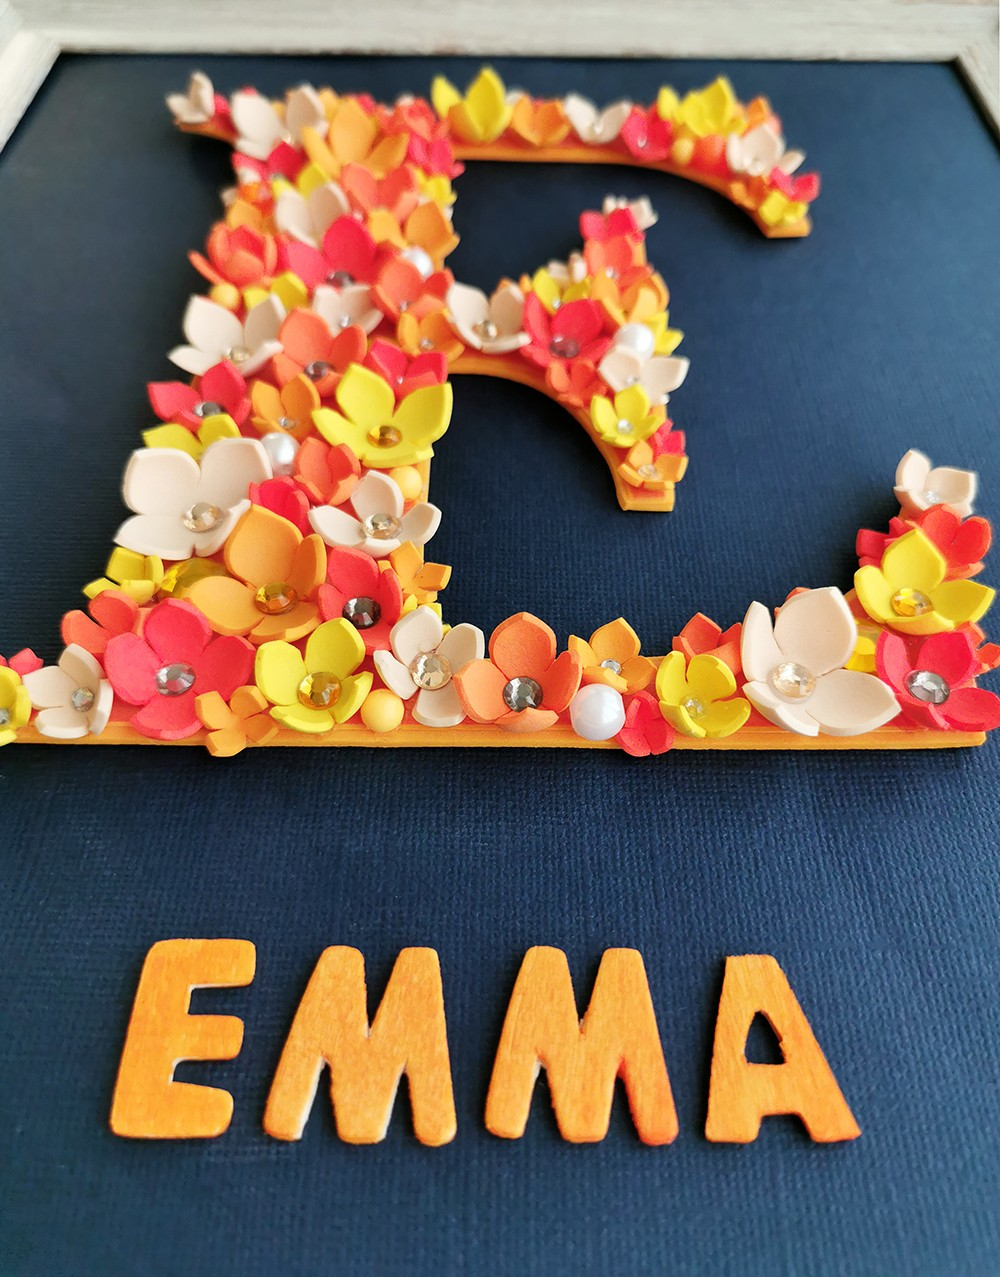 Flower Letter Personalized Frame - Girls Bedroom Décor (Large)